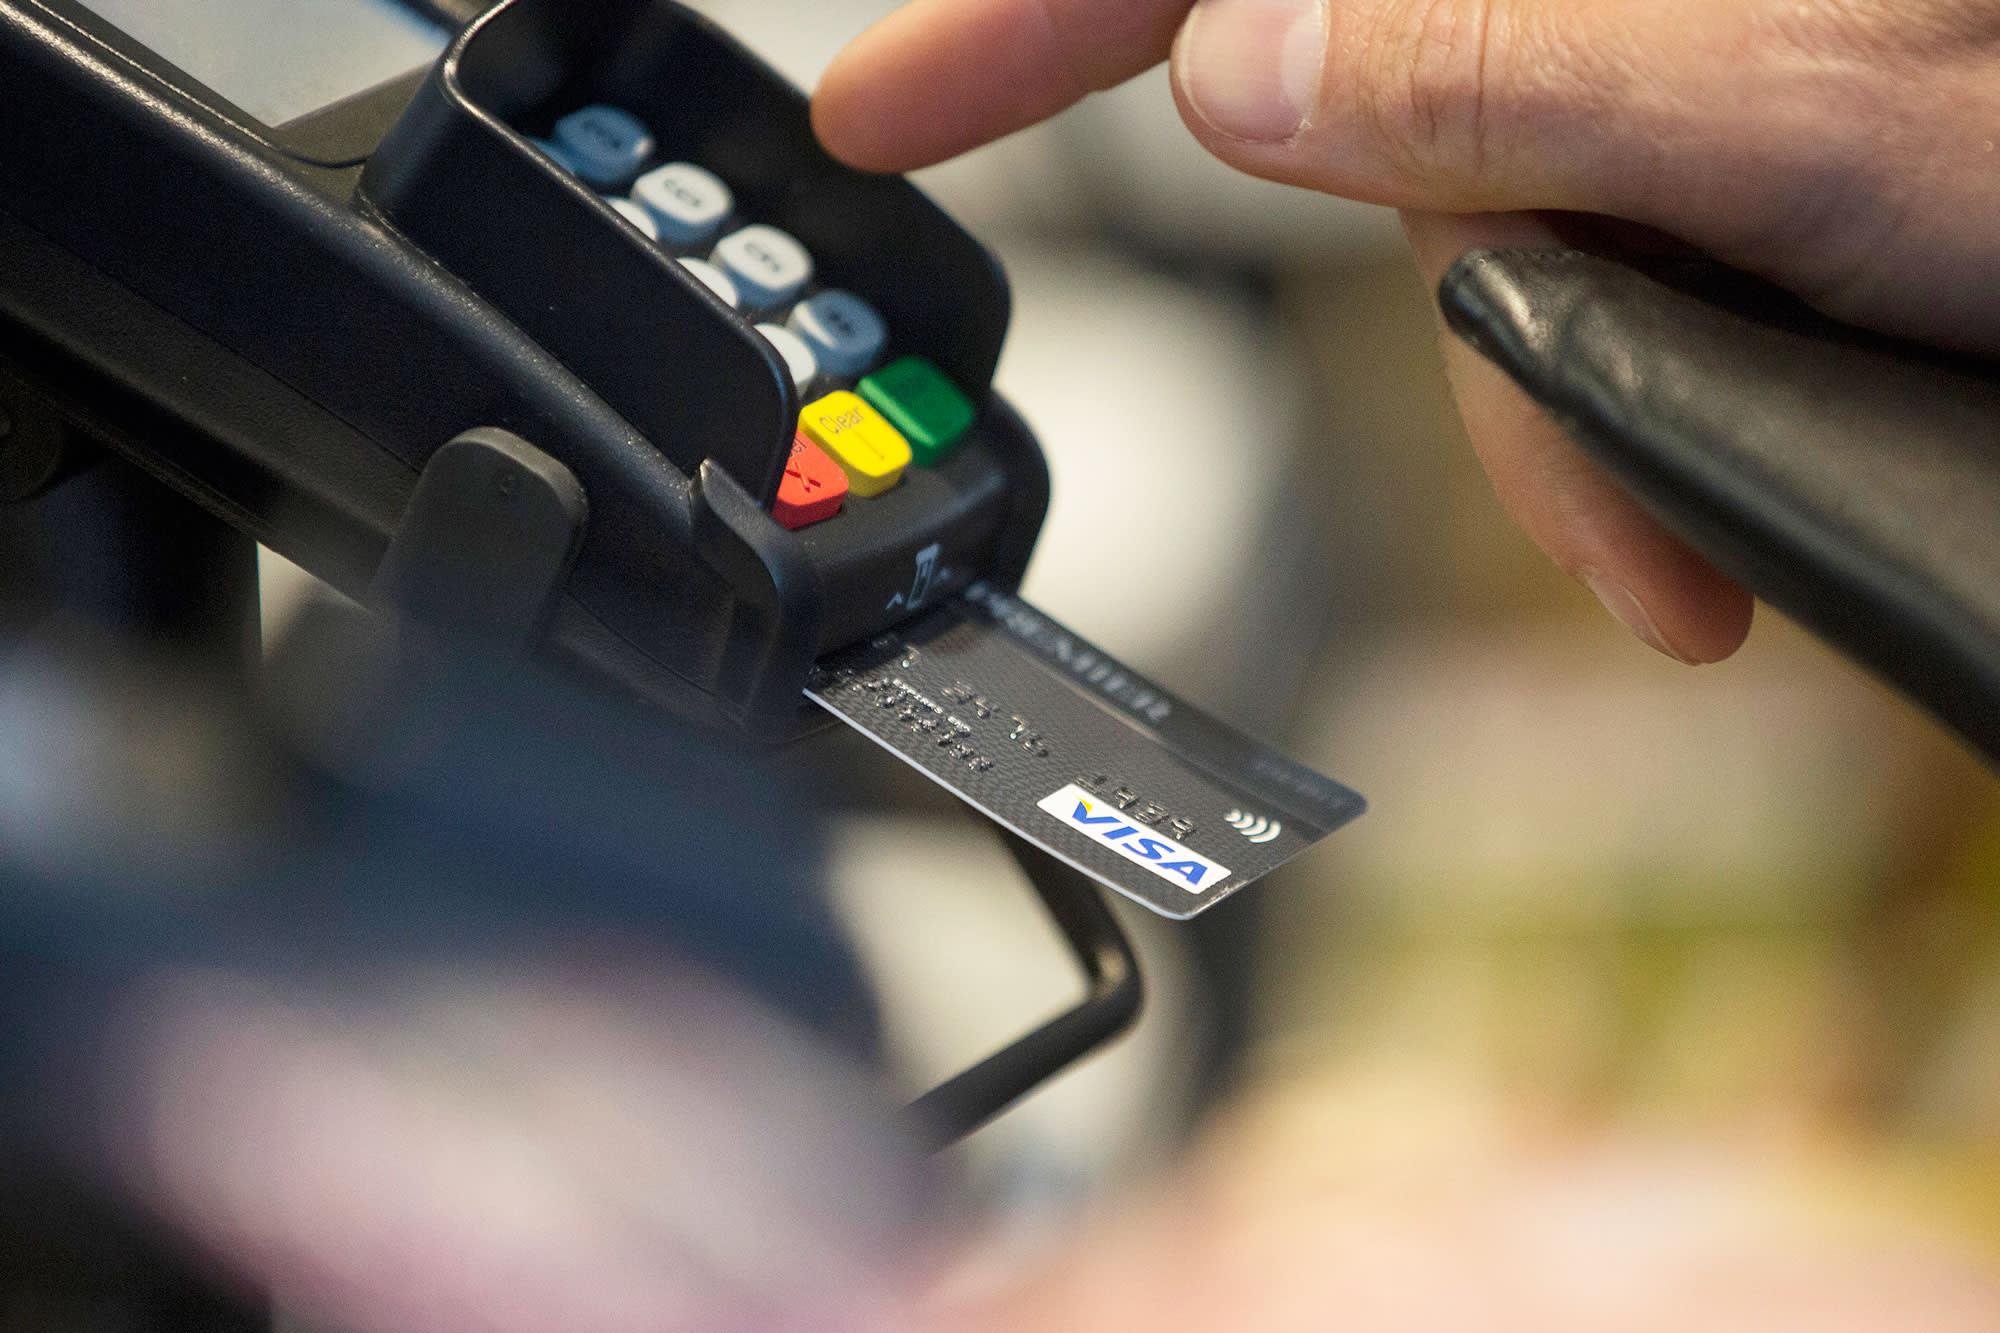 Kroger's California subsidiary to bar Visa credit cards amid fee dispute